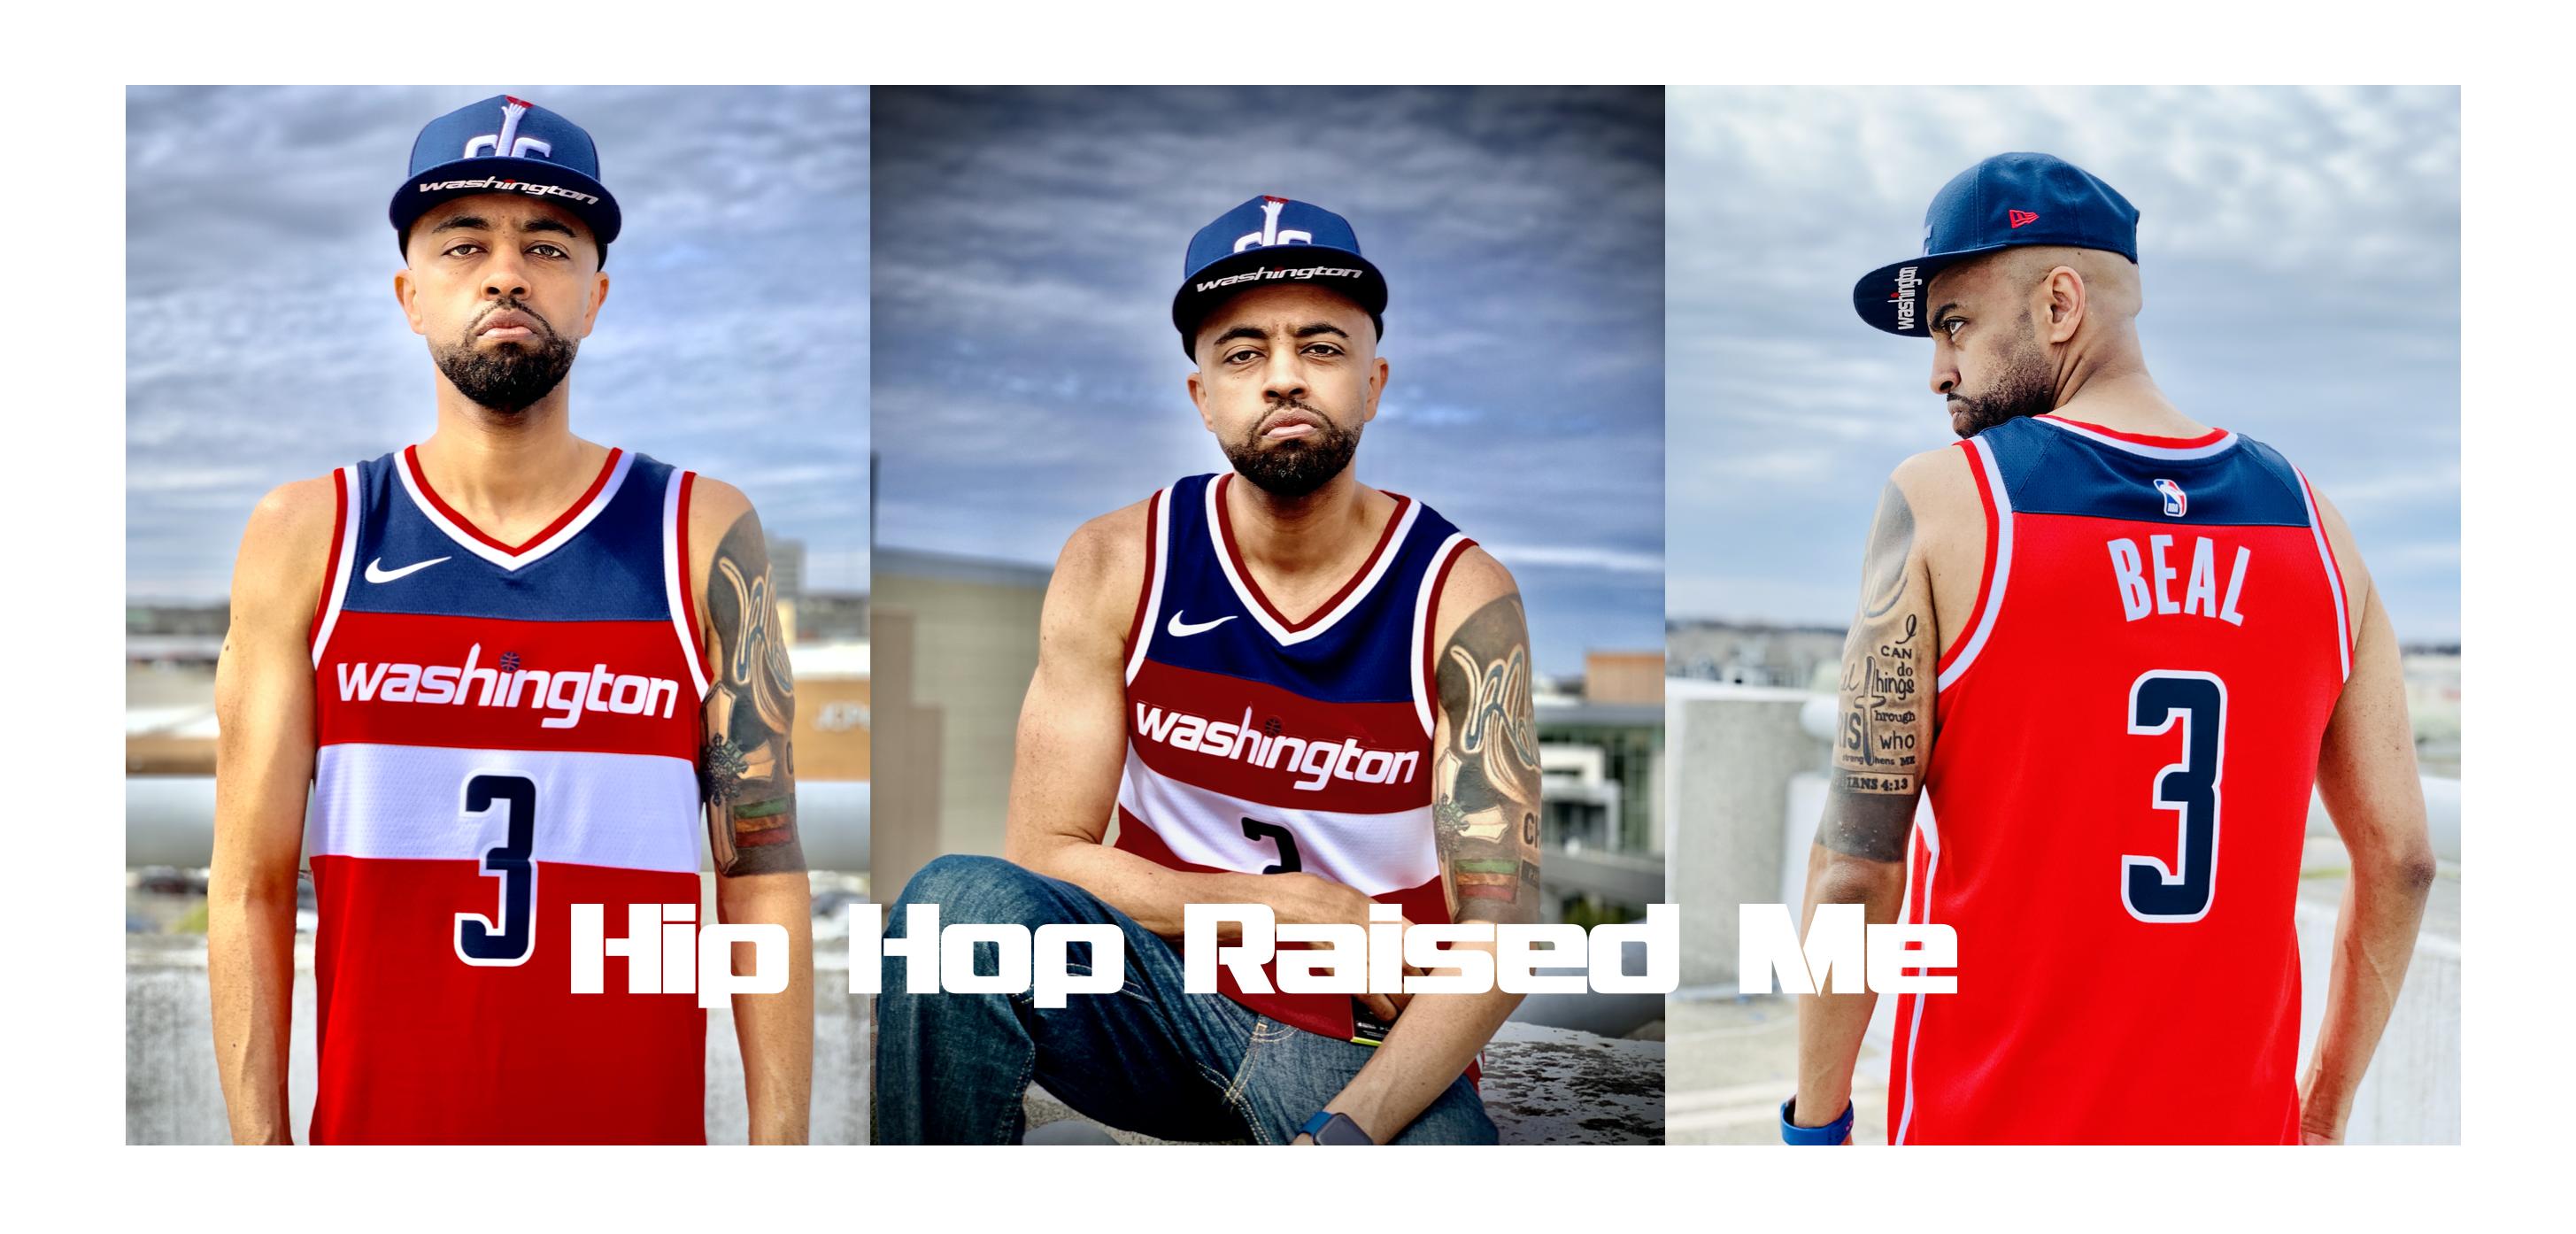 Abel Meri - Hip Hop Raised Me